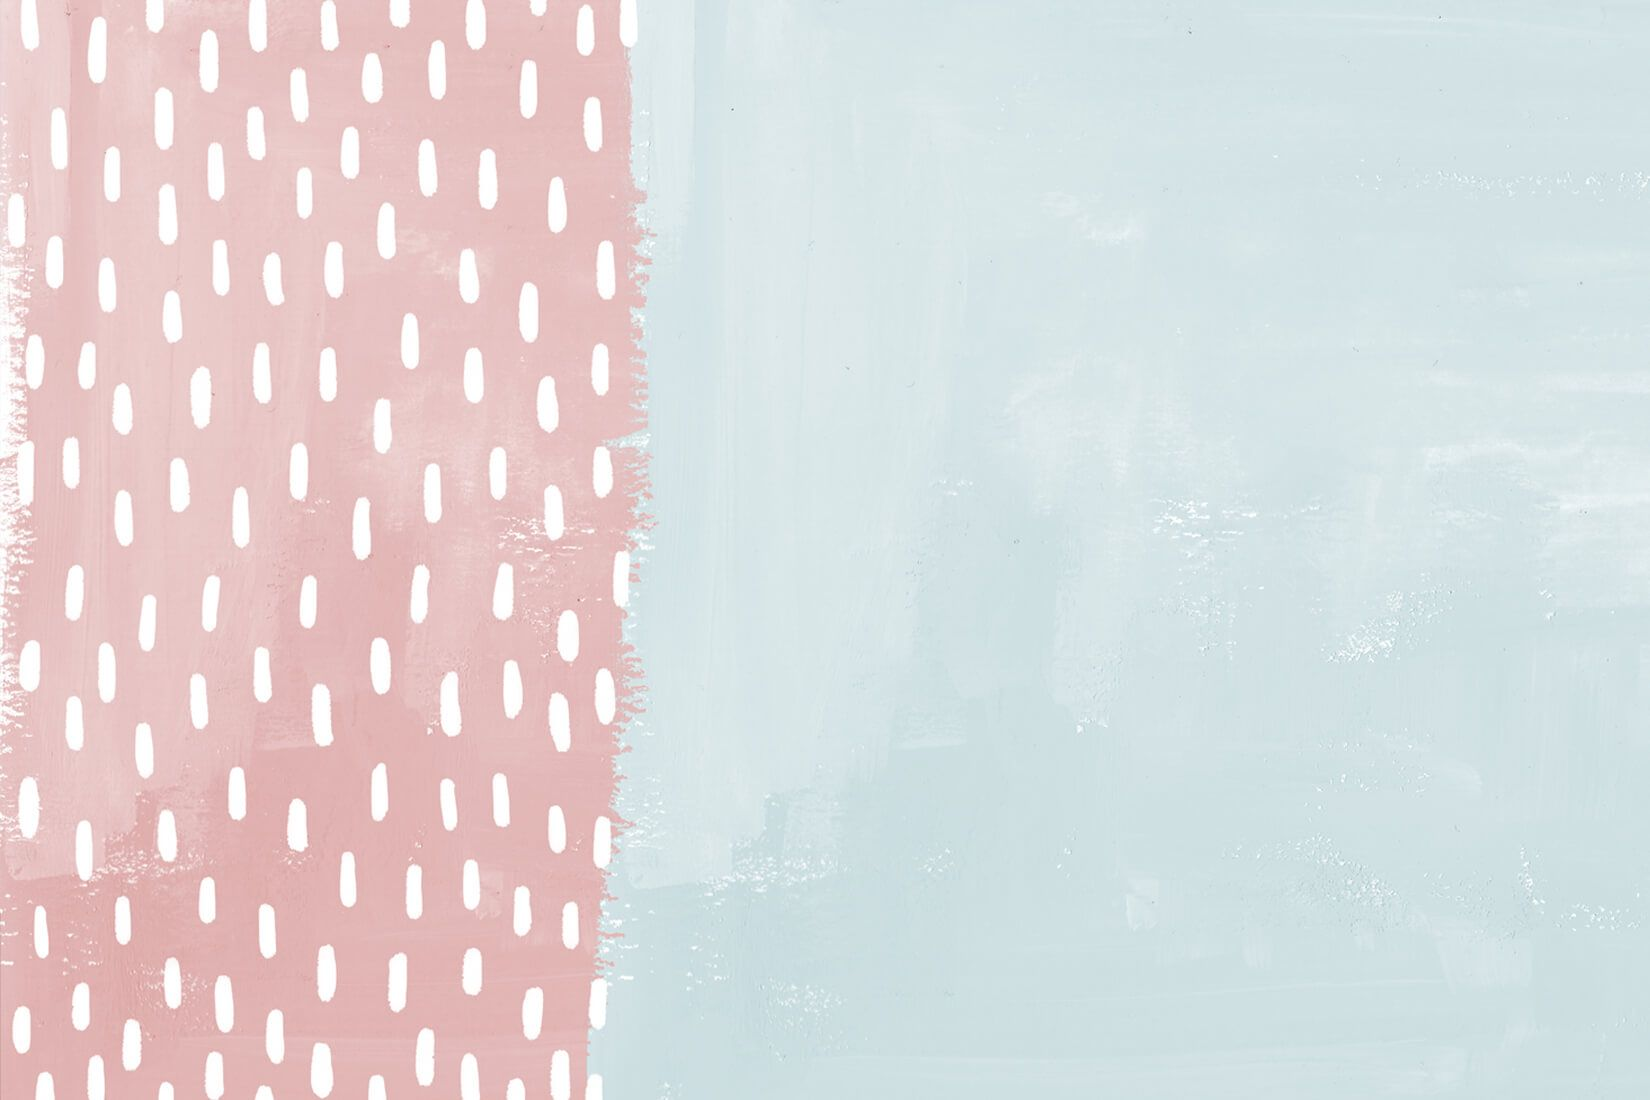 Pink And Blue Dash Wallpaper Mural Oboi Rozovo Goluboj Kartiny